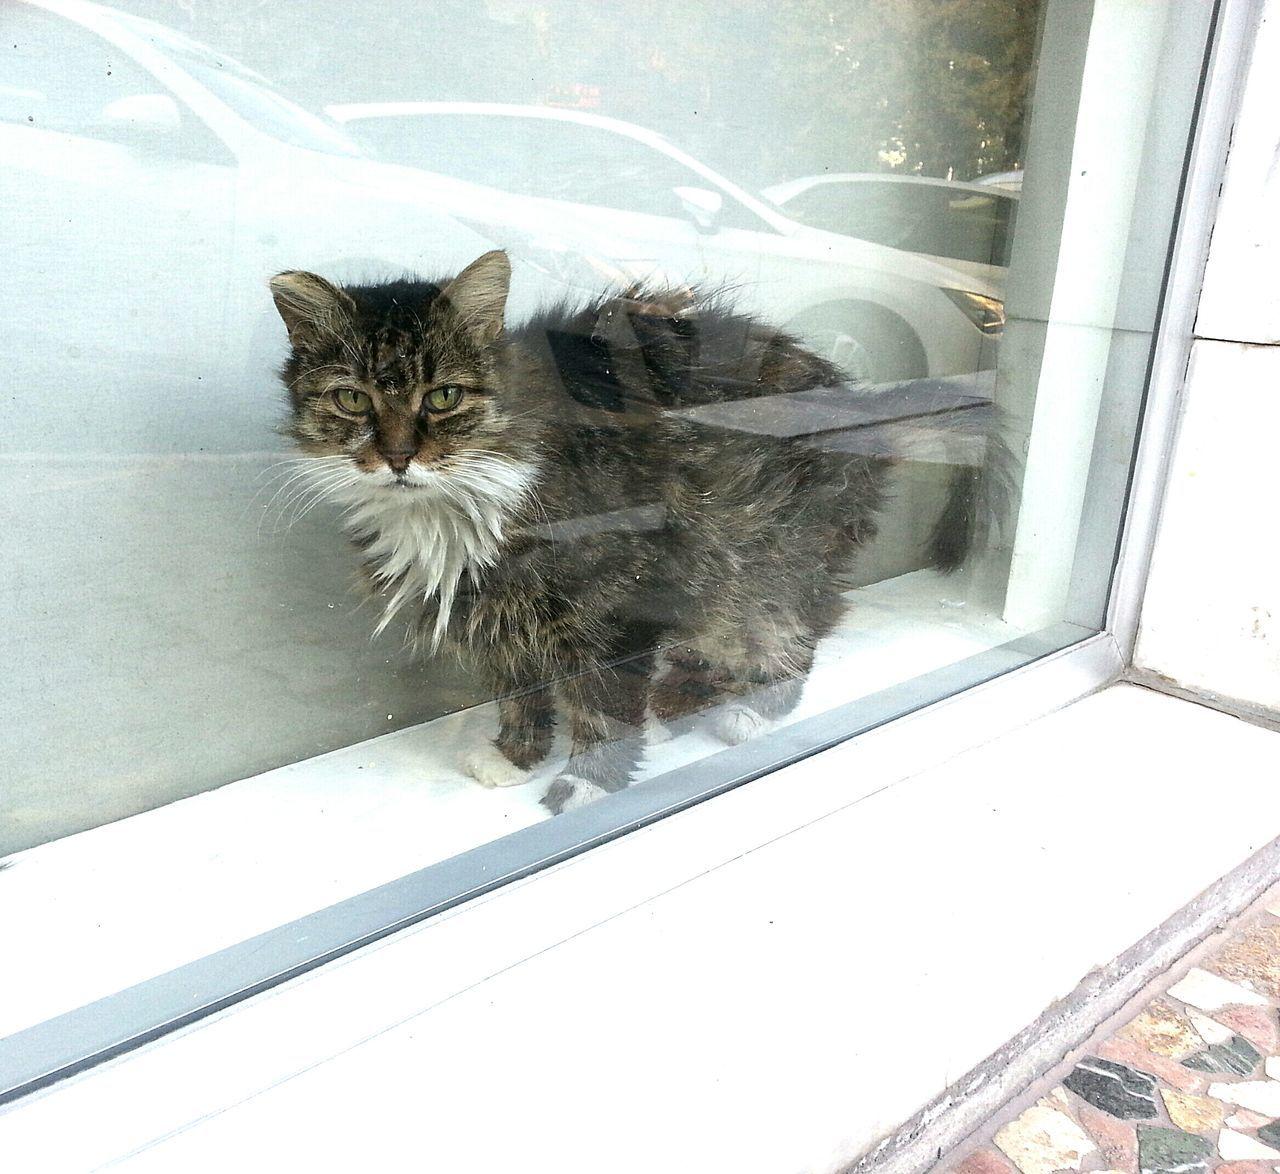 Domestic Cat Pets Domestic Animals Animal Themes Mammal Feline No People One Animal Indoors  Sliding Door Leopard Day